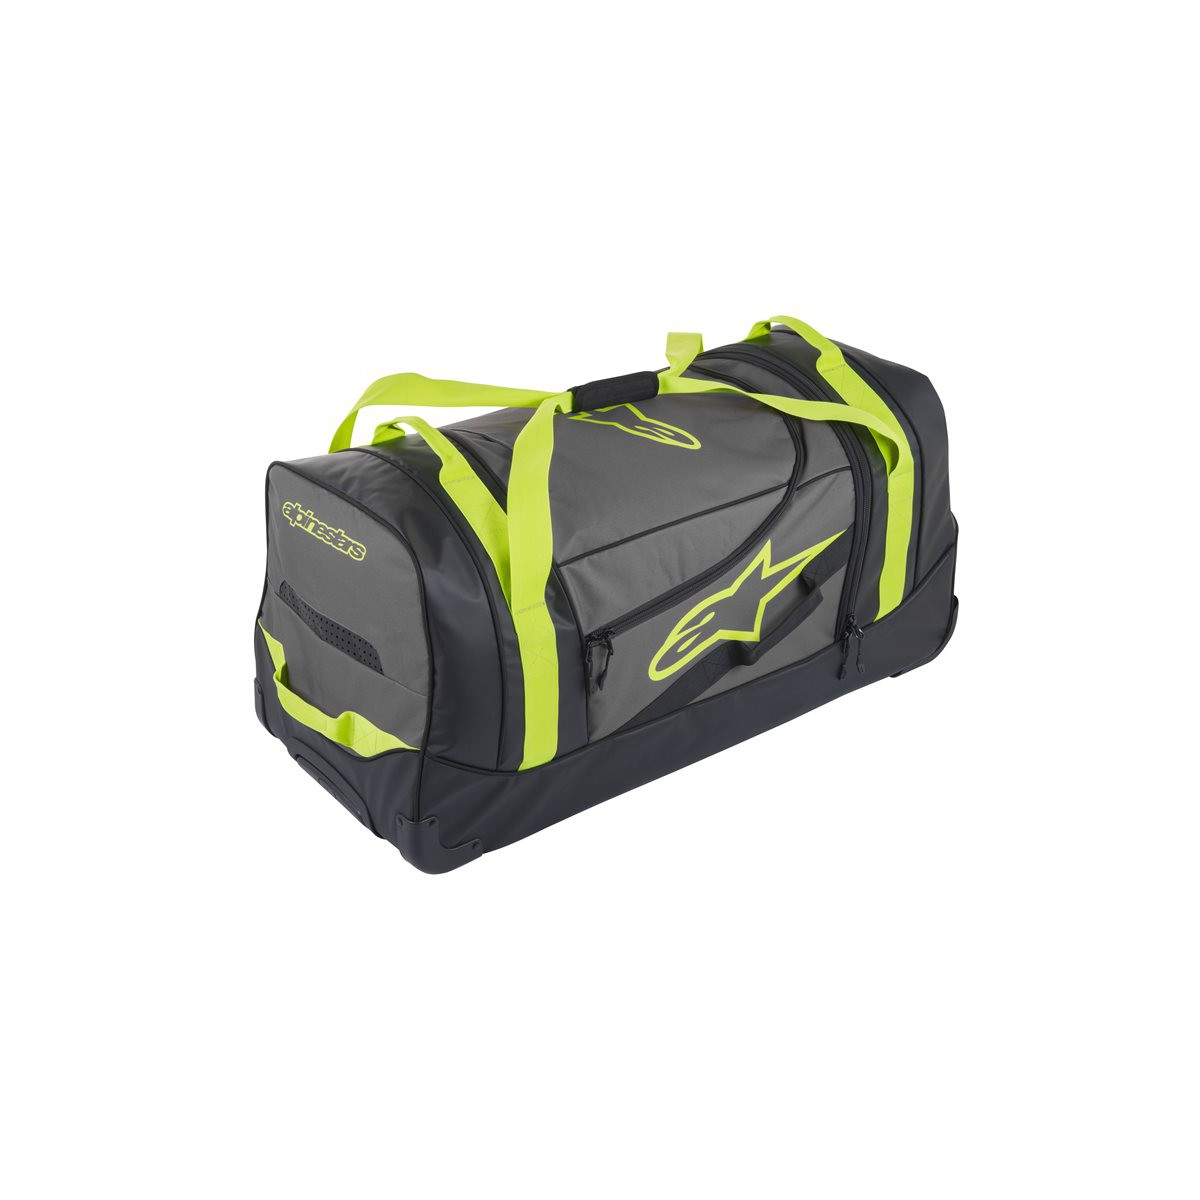 Komodo Travel Bag